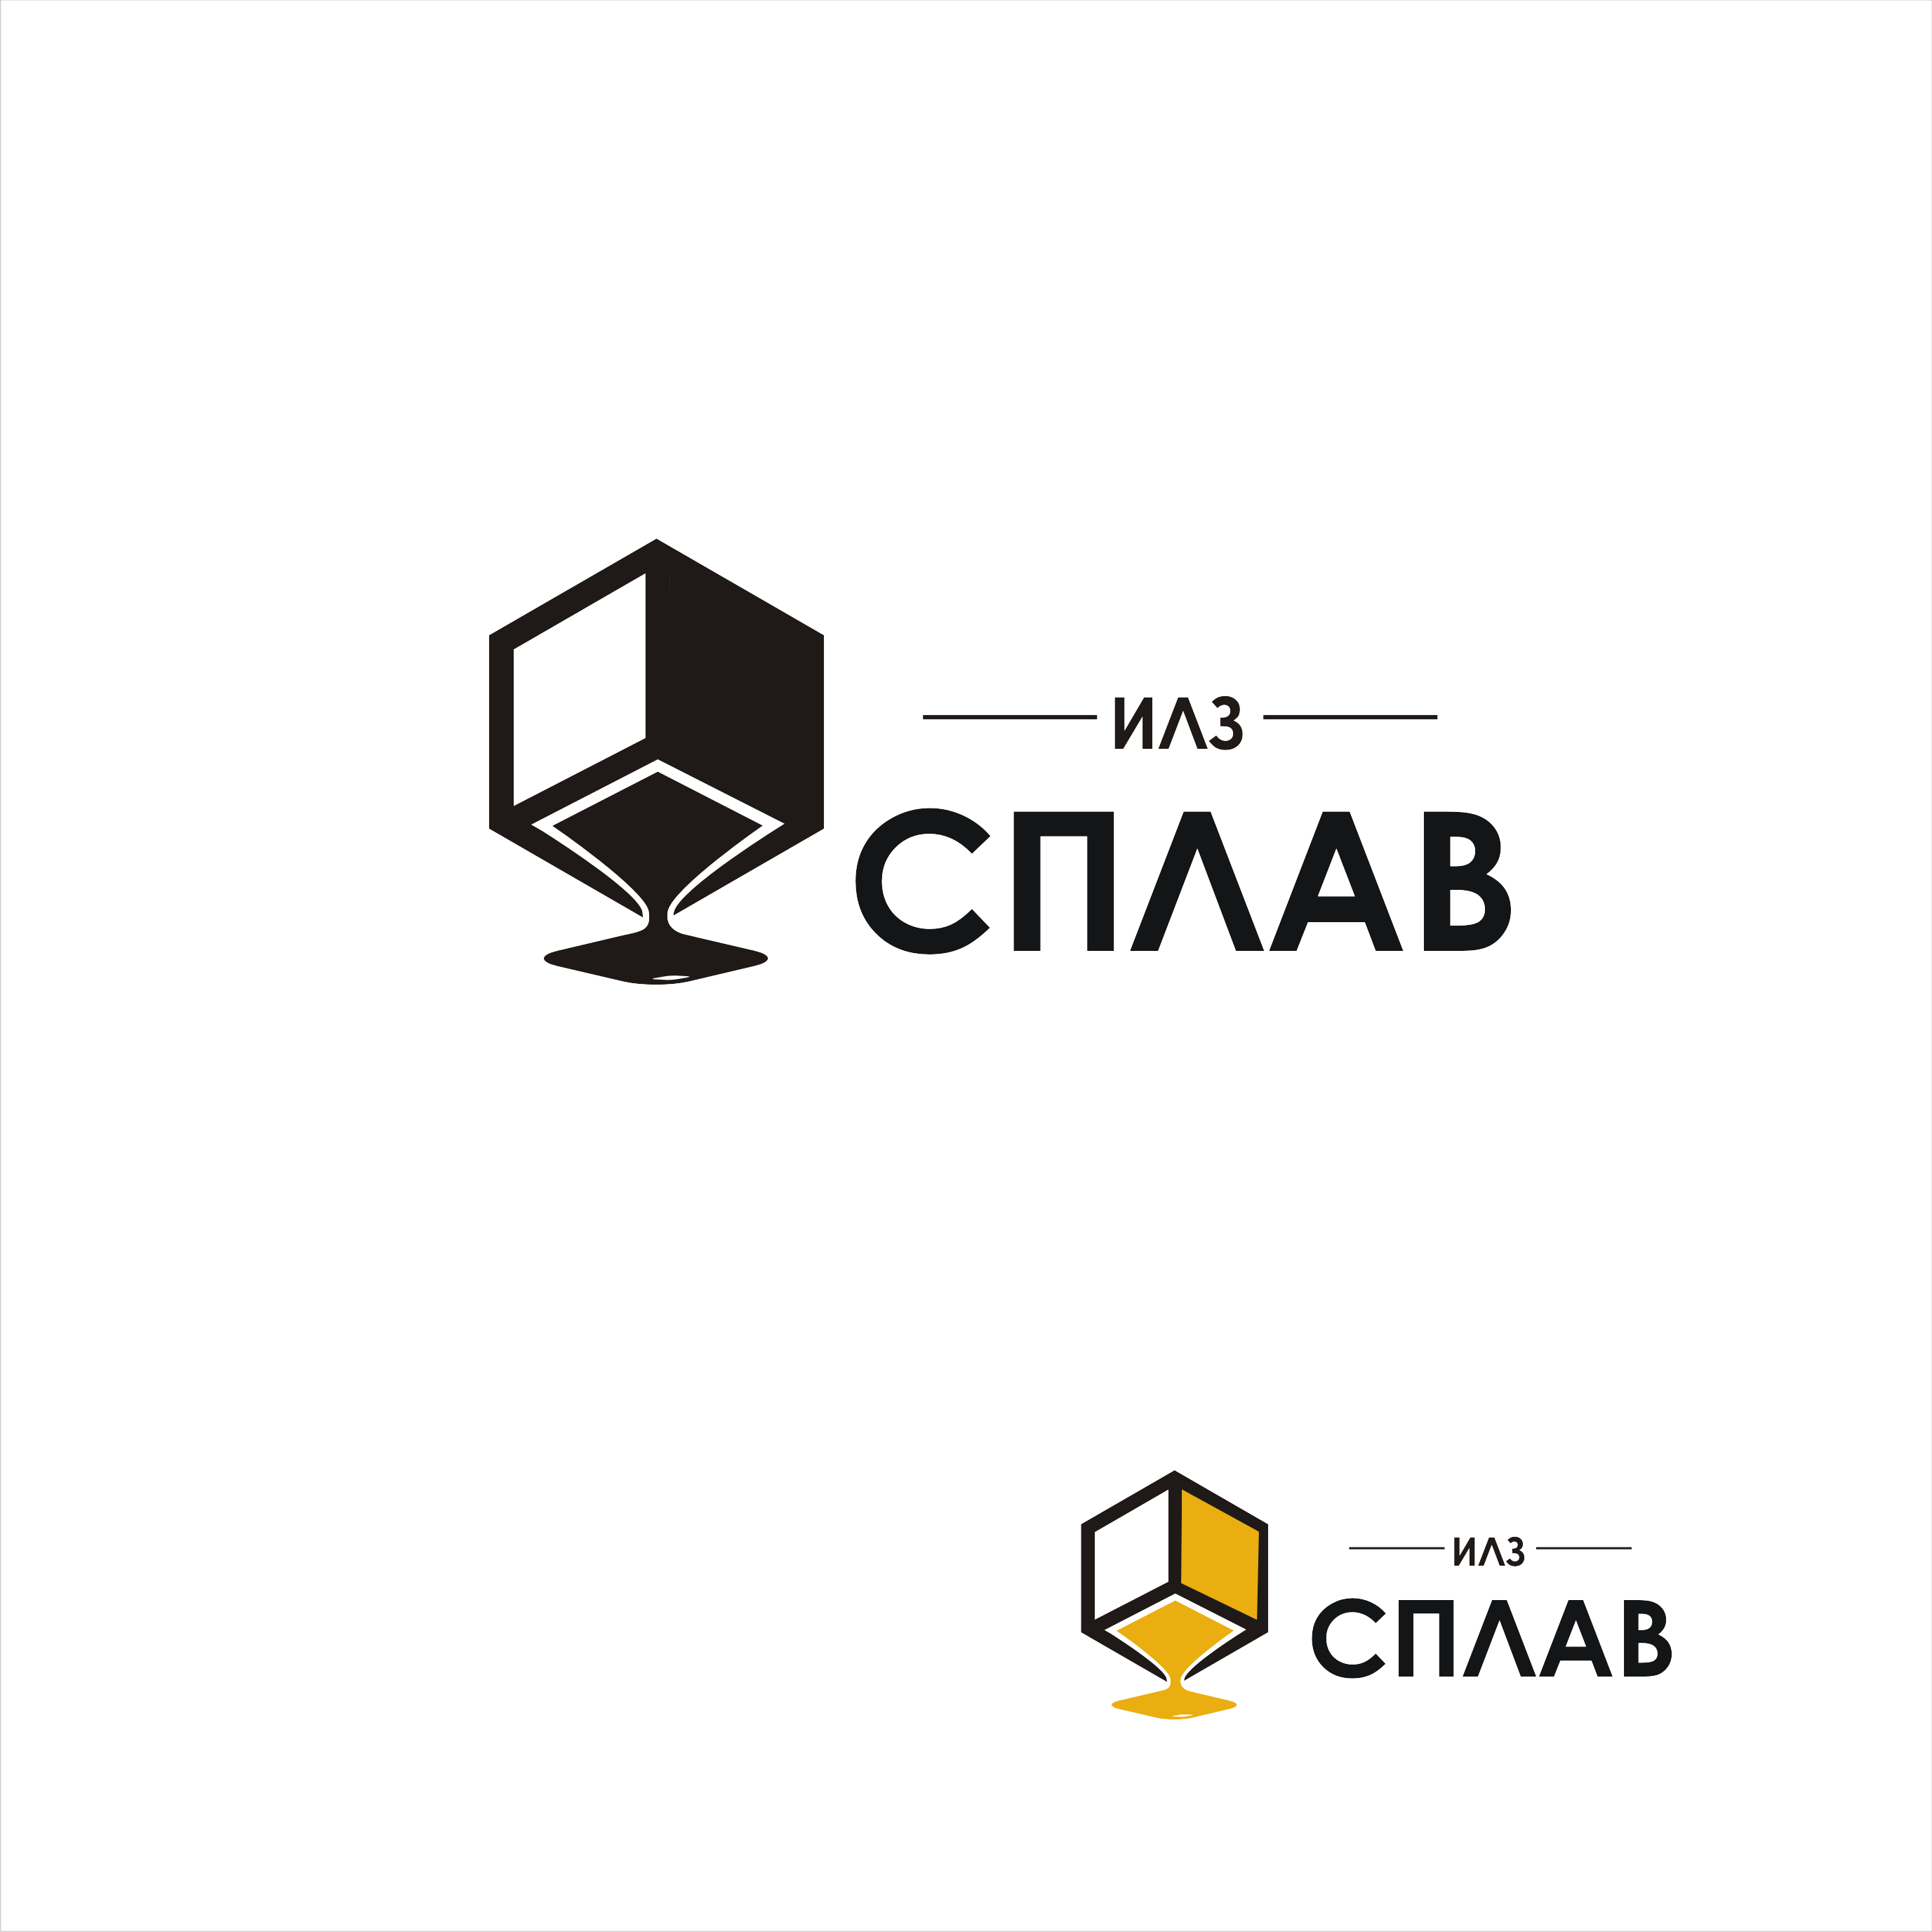 Разработать логотип для литейного завода фото f_2025afbe93dc06fb.png